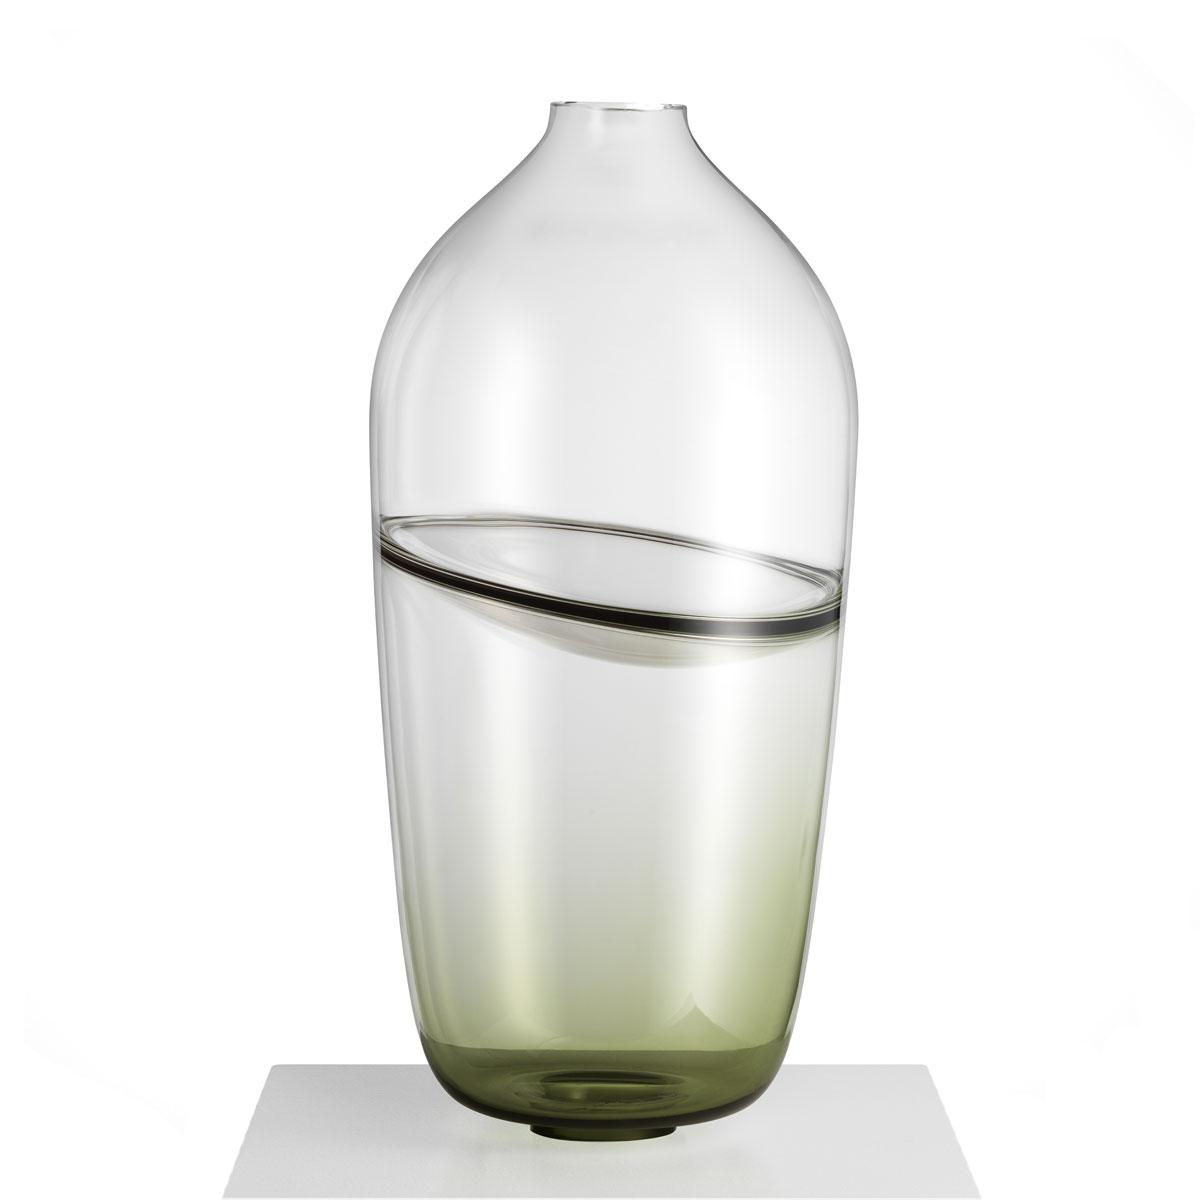 Kosta Boda Art Glass Mattias Stenberg Septum Vase Limited Edition of 50